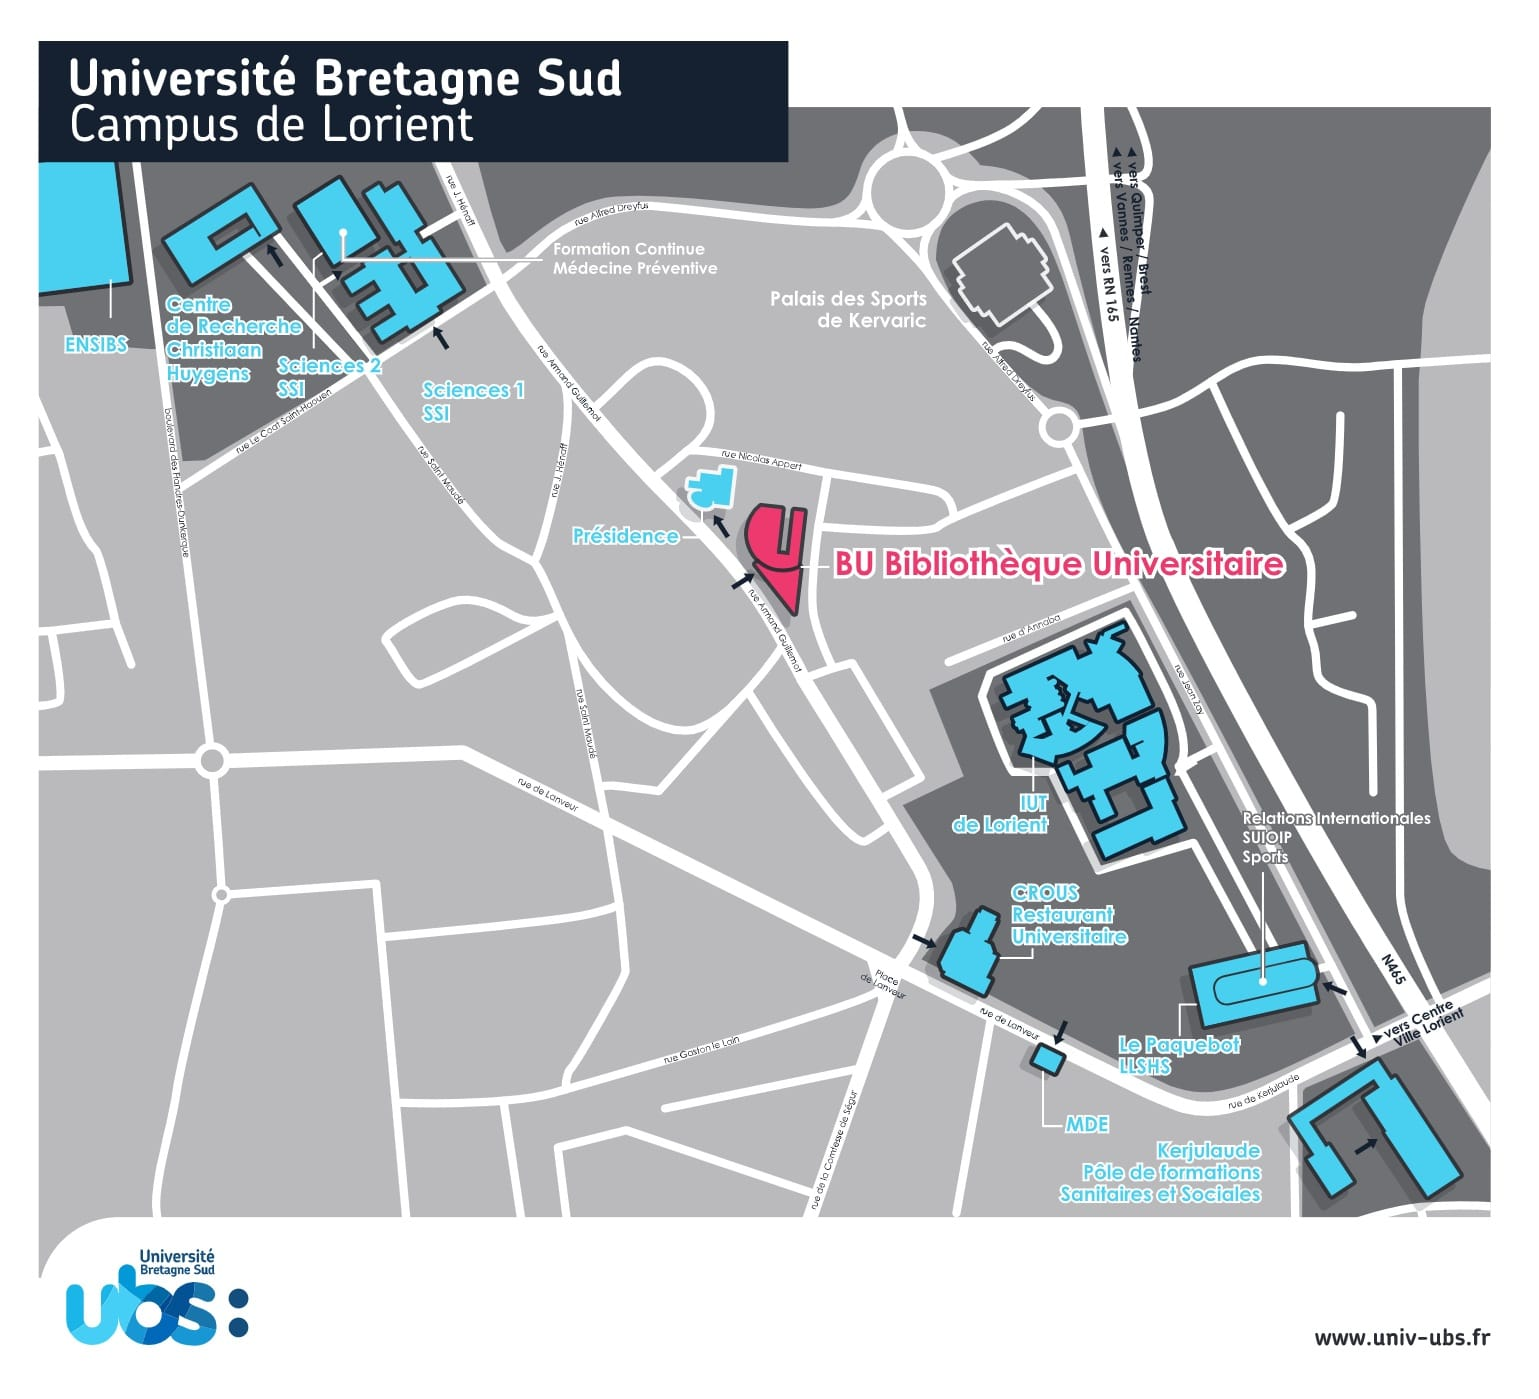 https://visite-bibliotheque-universitaire-ubs.fr/wp-content/uploads/2020/10/UBS-Campus-Lorient-2020-BU.jpg